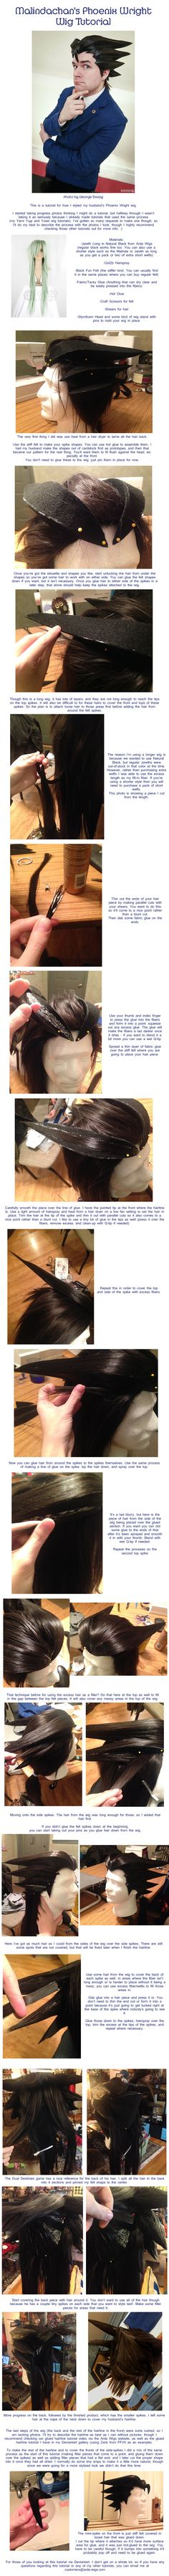 Phoenix Wright Wig Tutorial by Malindachan on deviantART